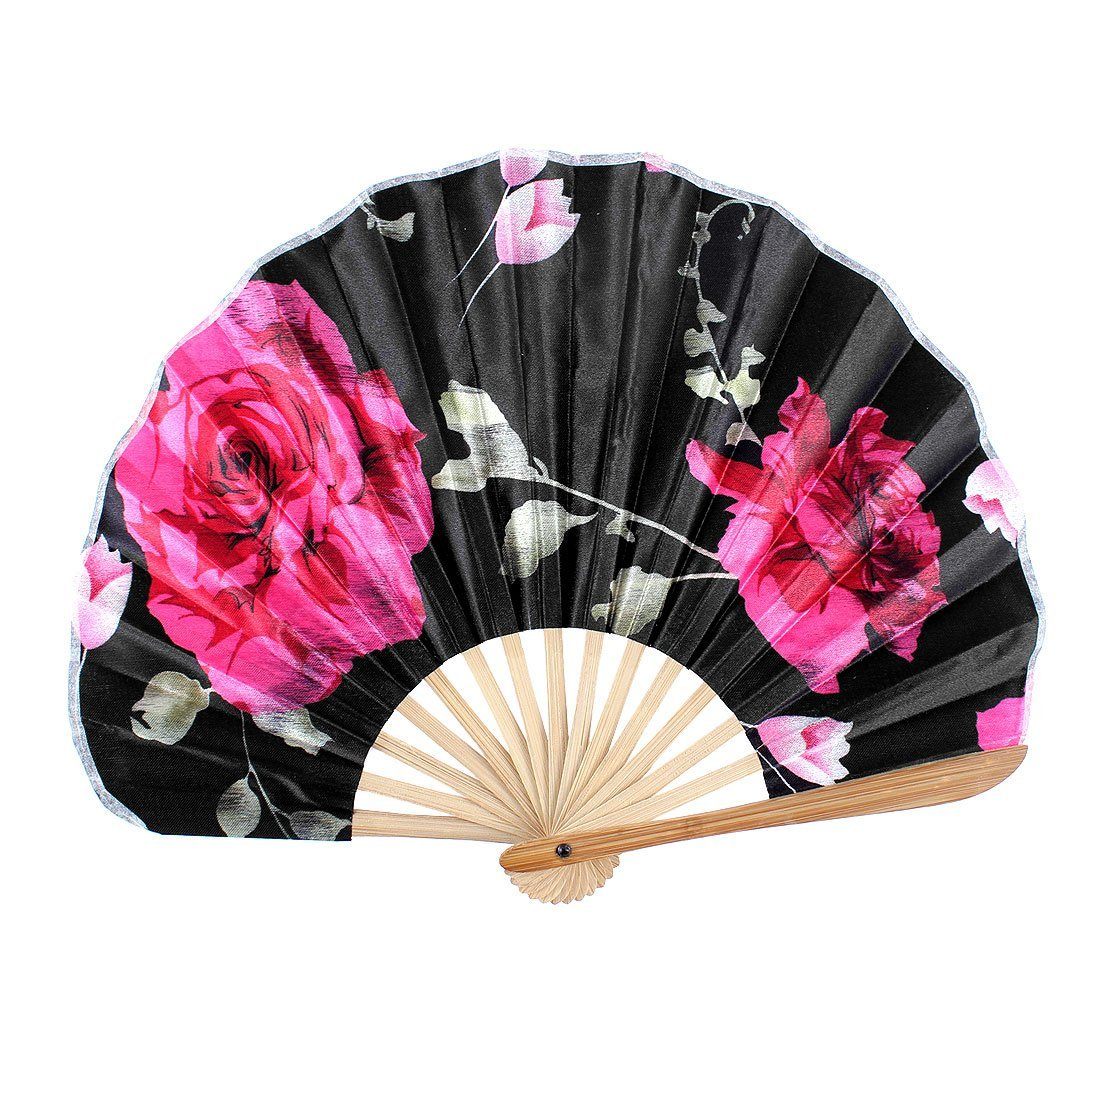 uxcell Wood Ribs Seashell Shape Rose Printed Folding Summer Hand Fan Black